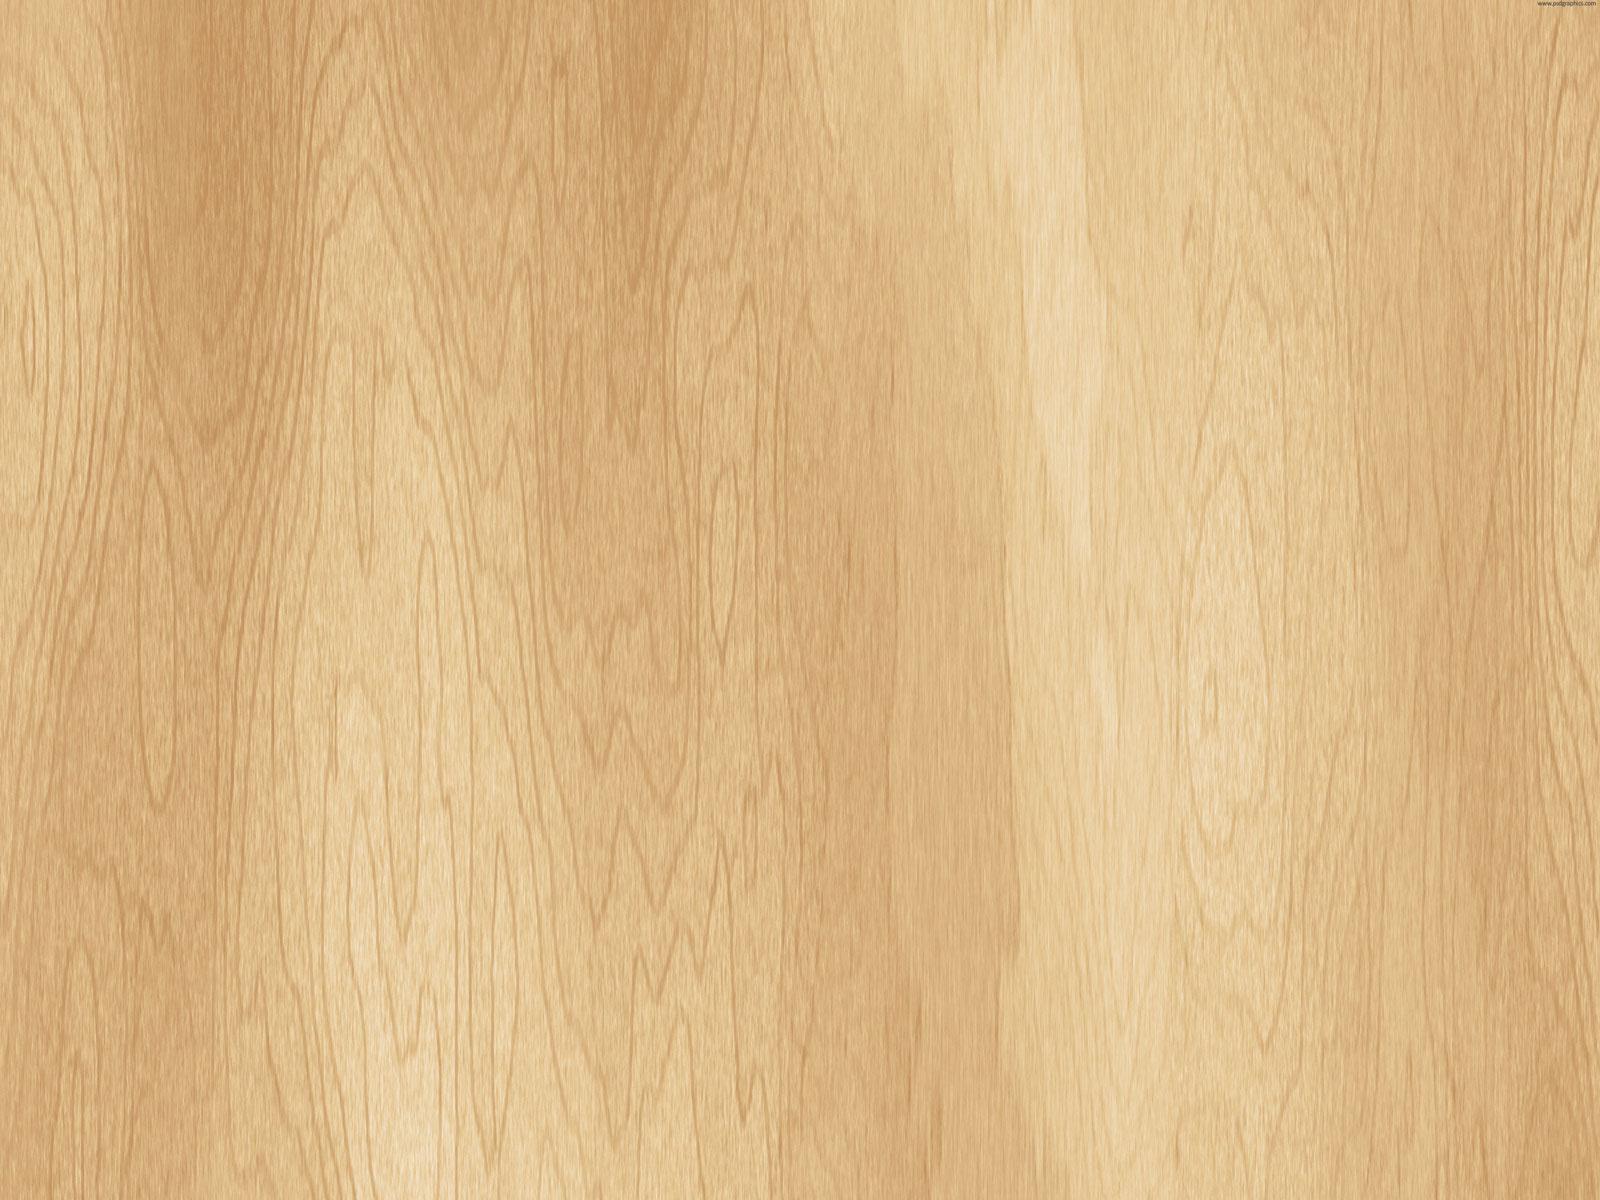 wood-light-1600x1200.jpg